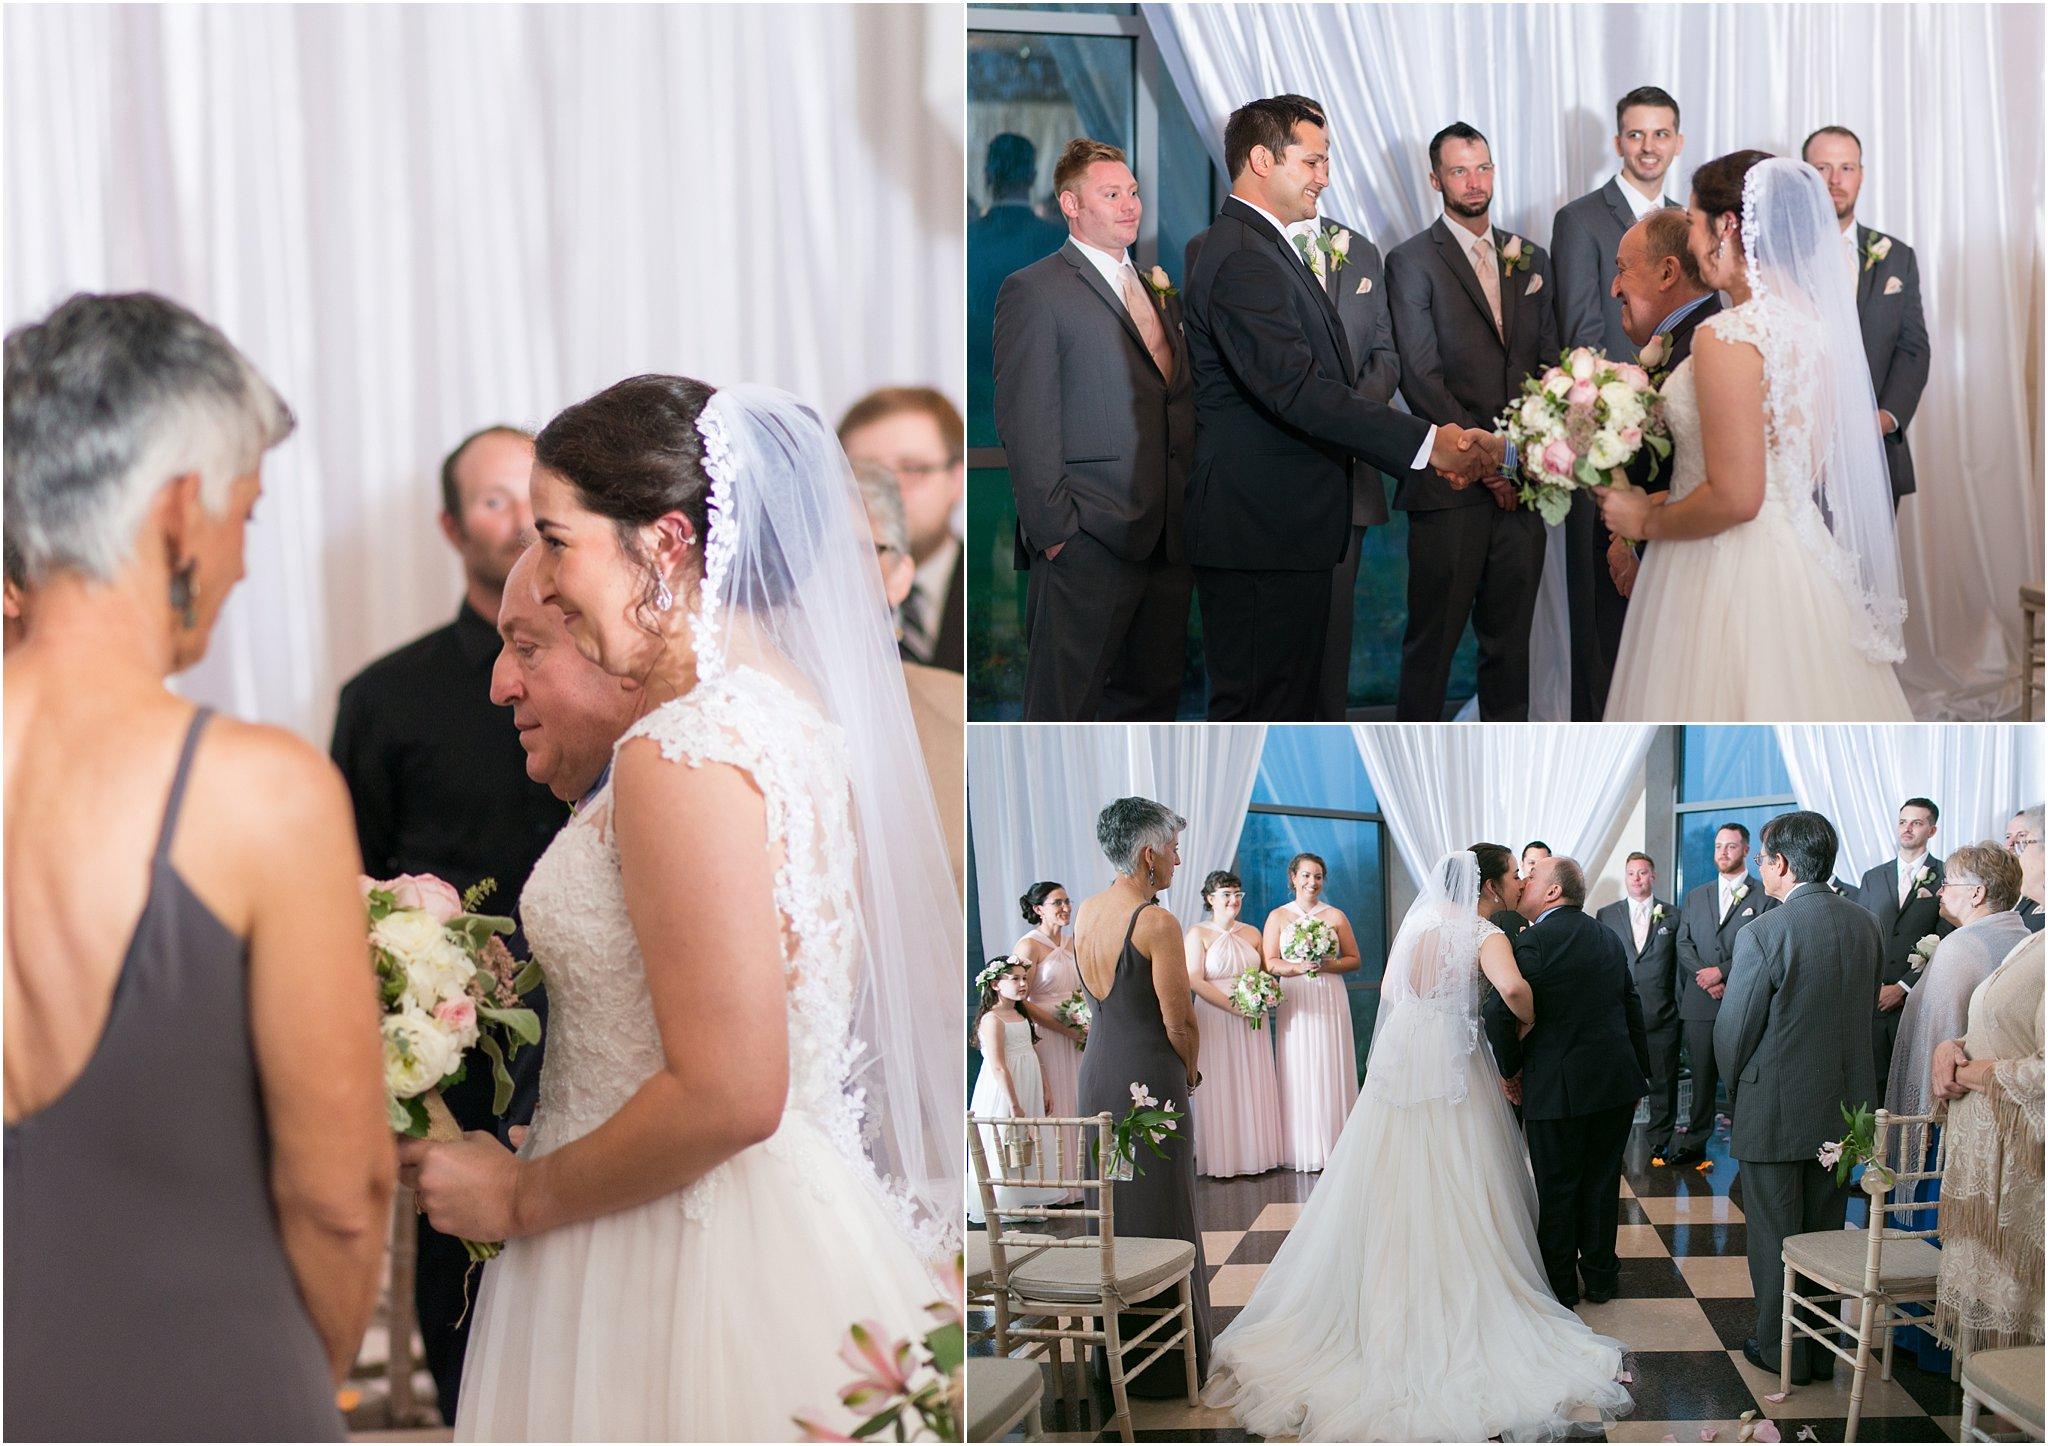 jessica_ryan_photography_virginia_wedding_photographer_wedding_hurricane_norfolk_botanical_gardens_hurricane_matthew_wedding_3589